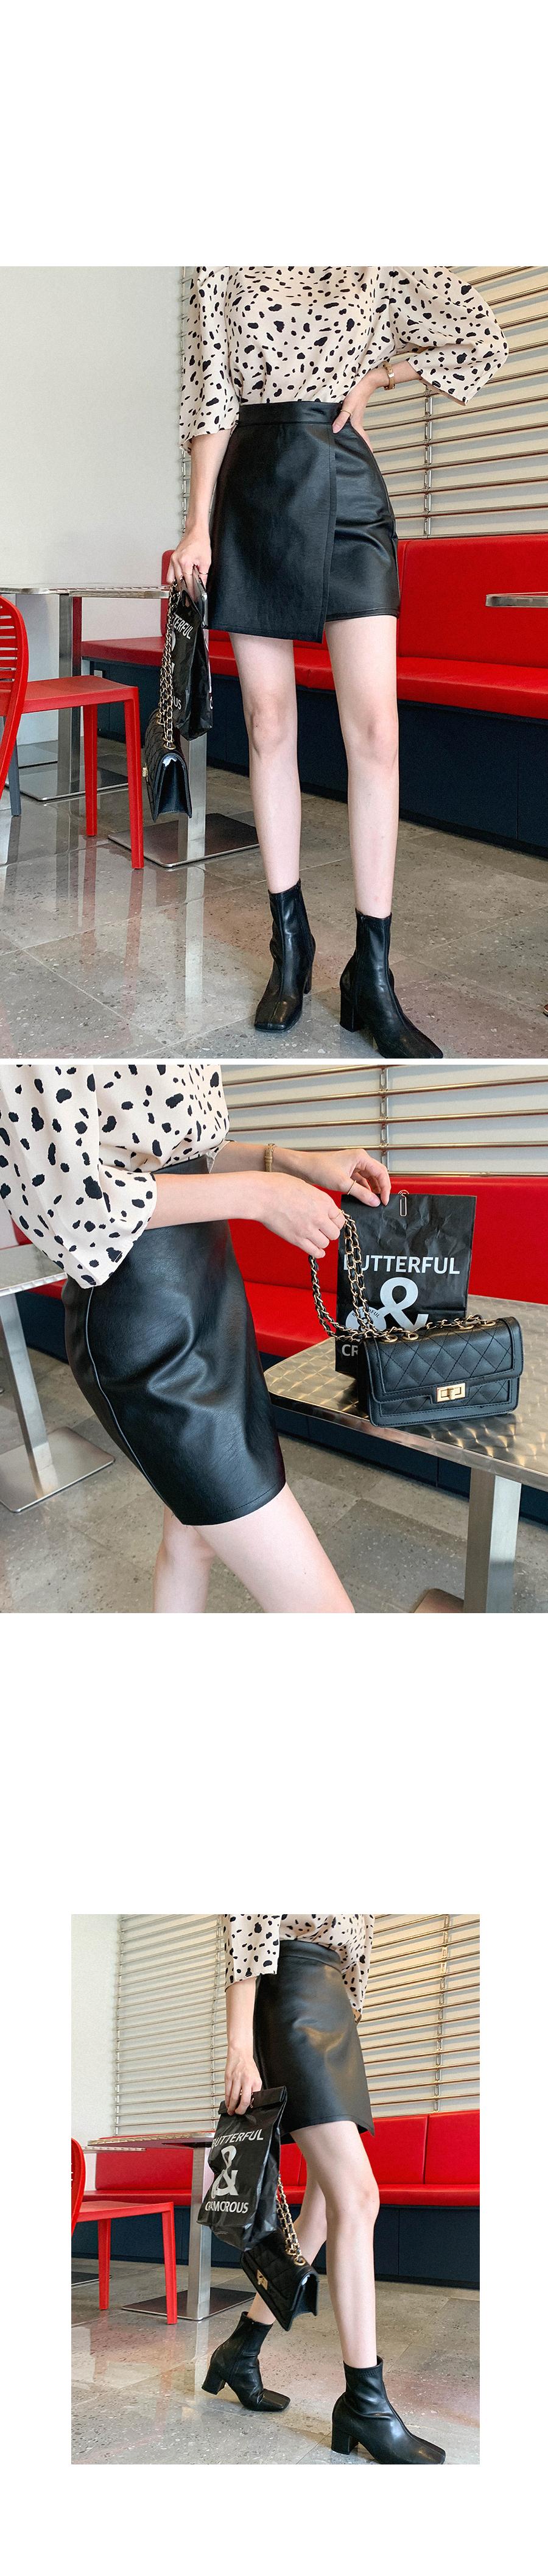 Heartbeat leather mini skirt